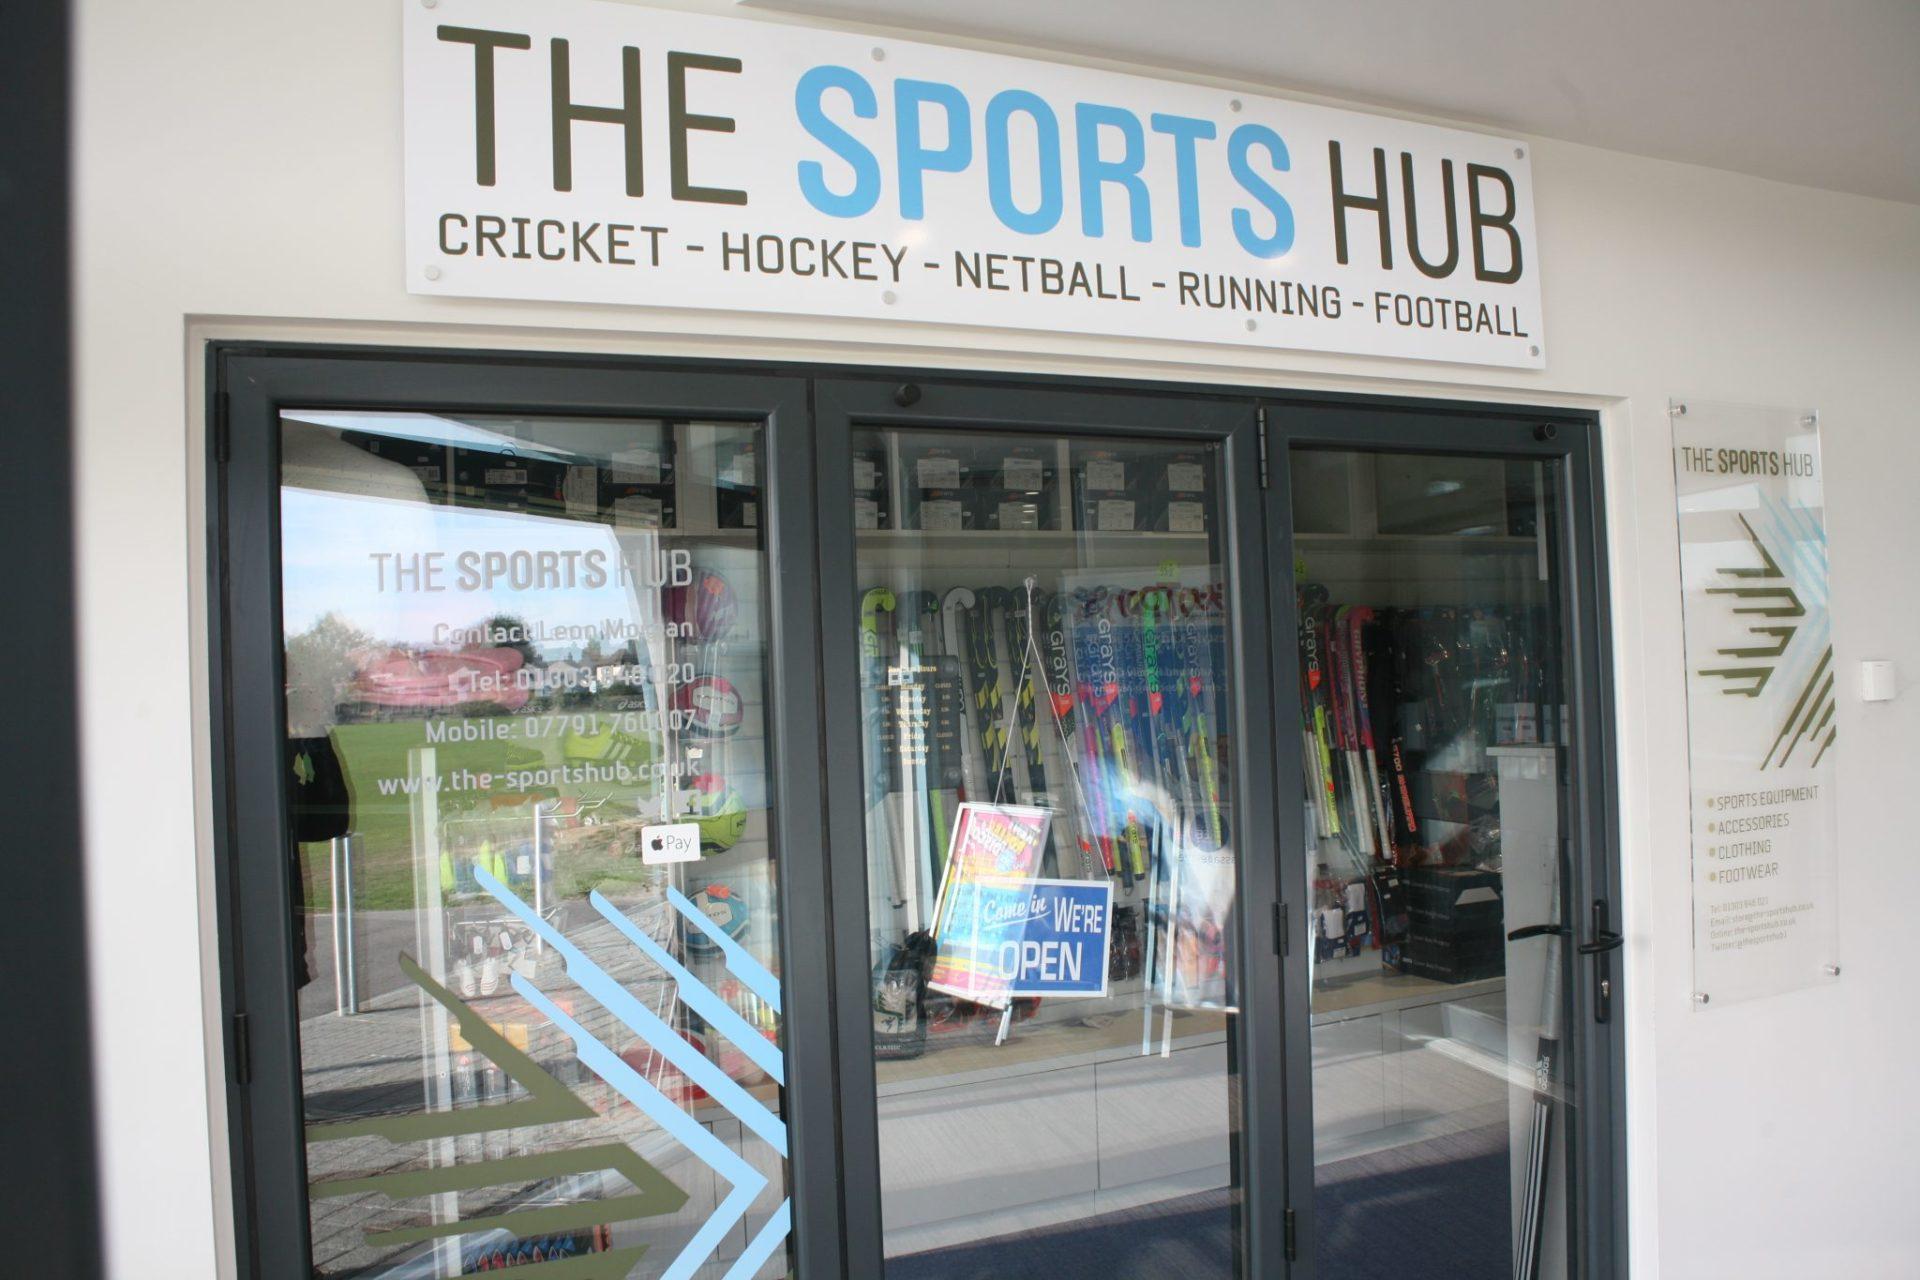 The sports hub shop